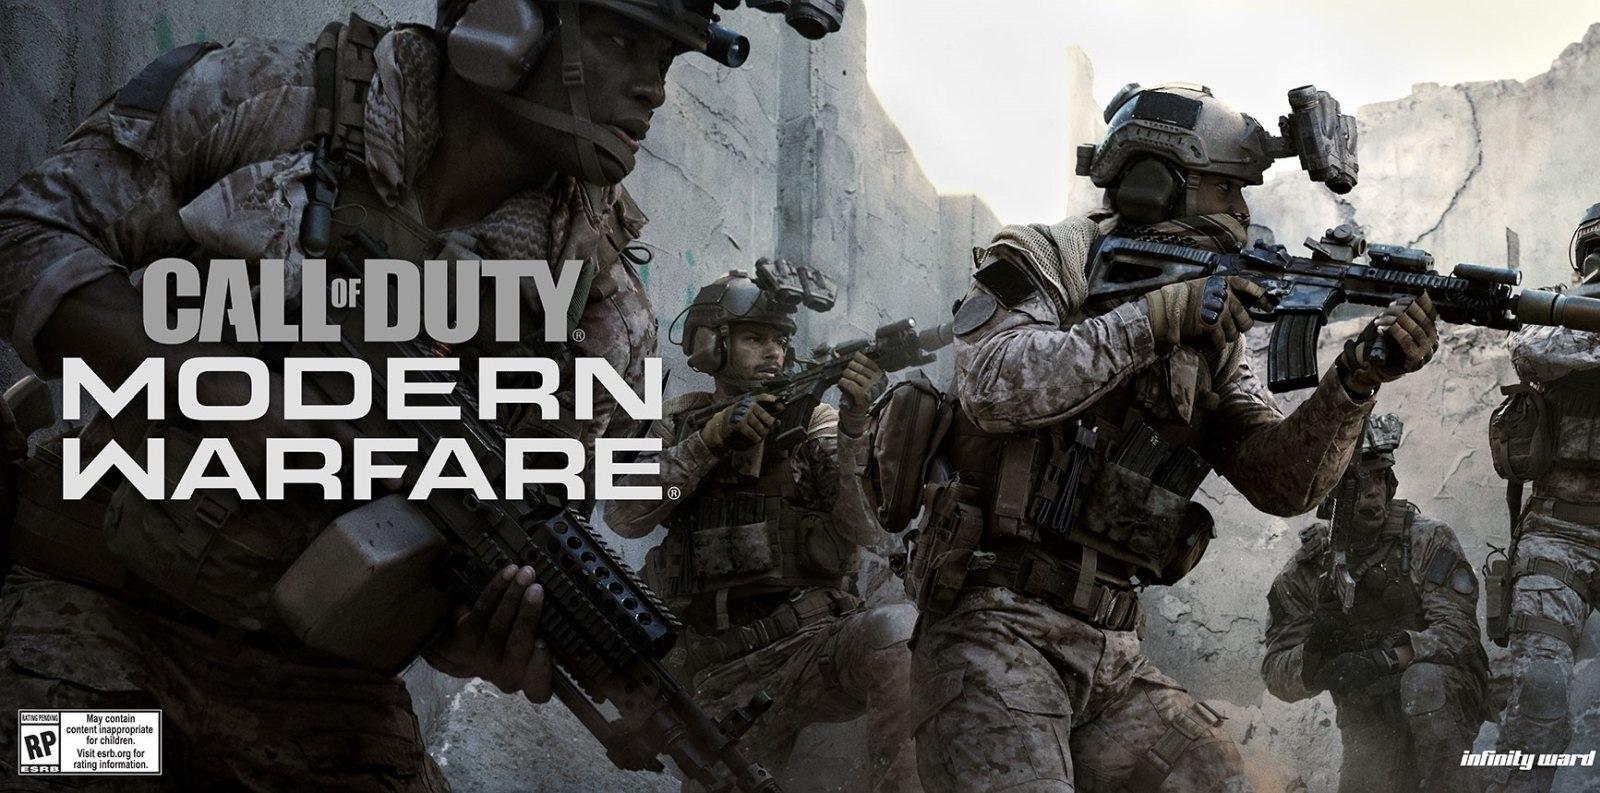 Call of Duty: Modern Warfare; screenshot: cover